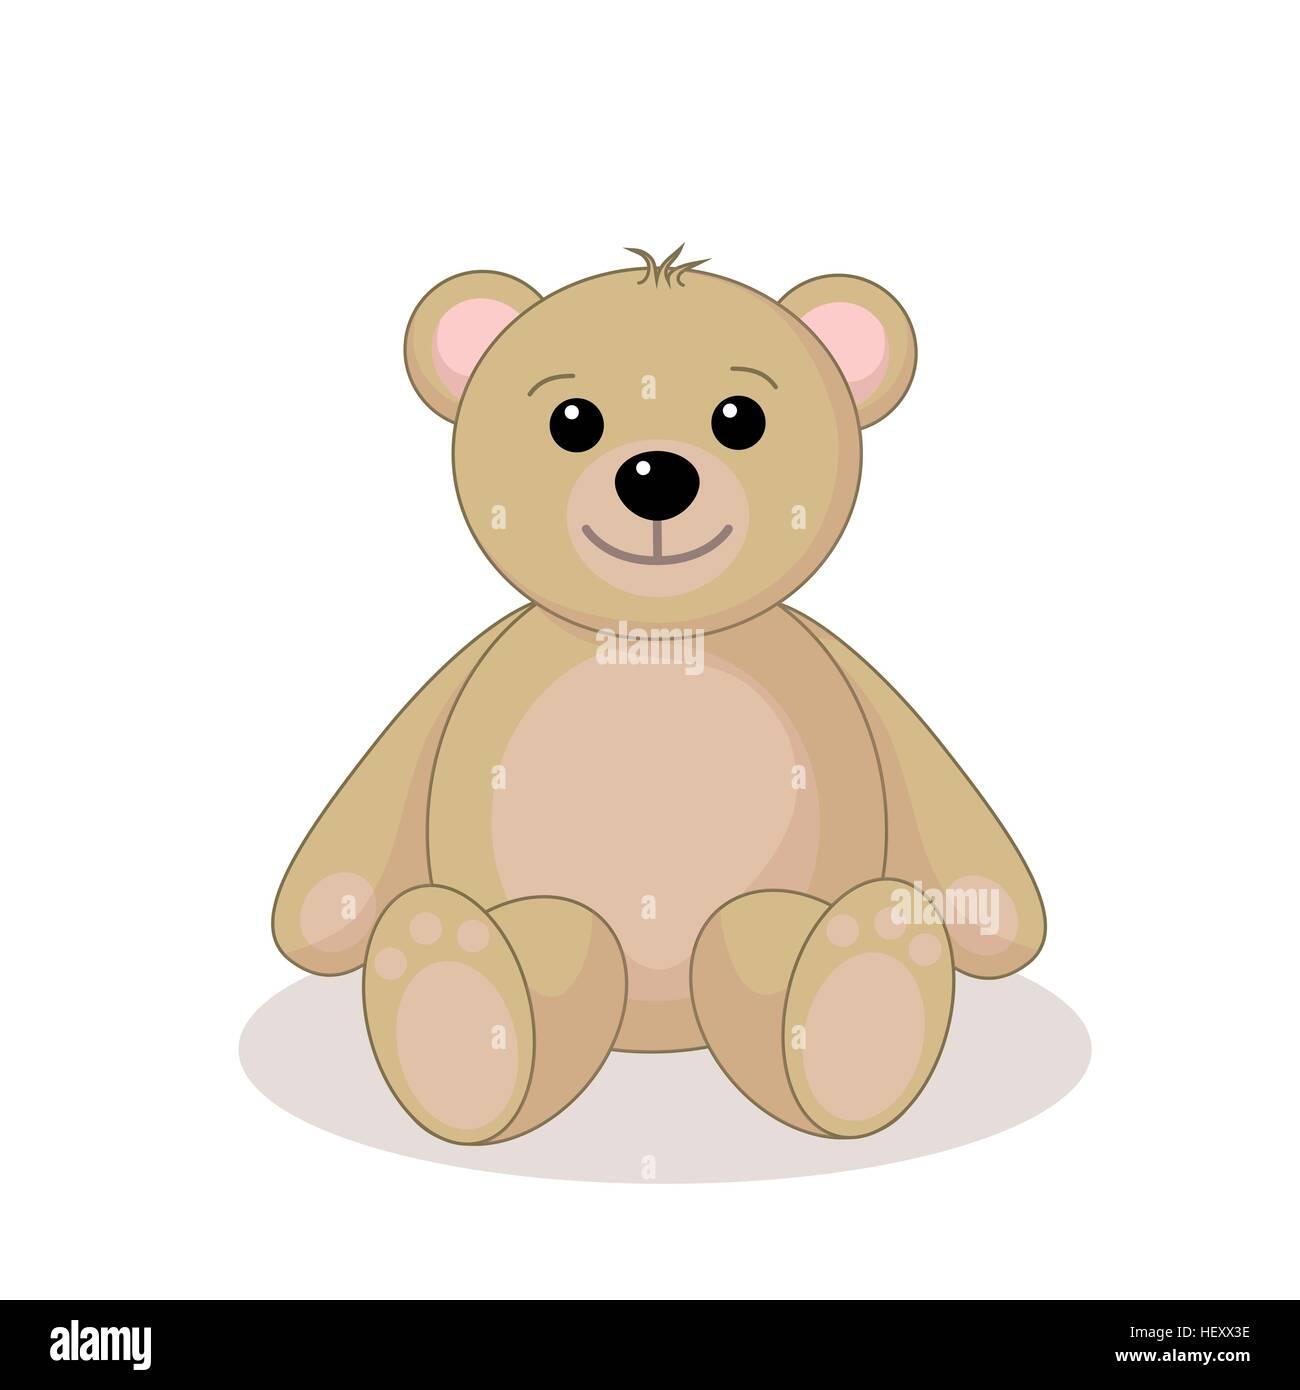 Teddy Bear Drawing Stockfotos & Teddy Bear Drawing Bilder - Seite 3 ...